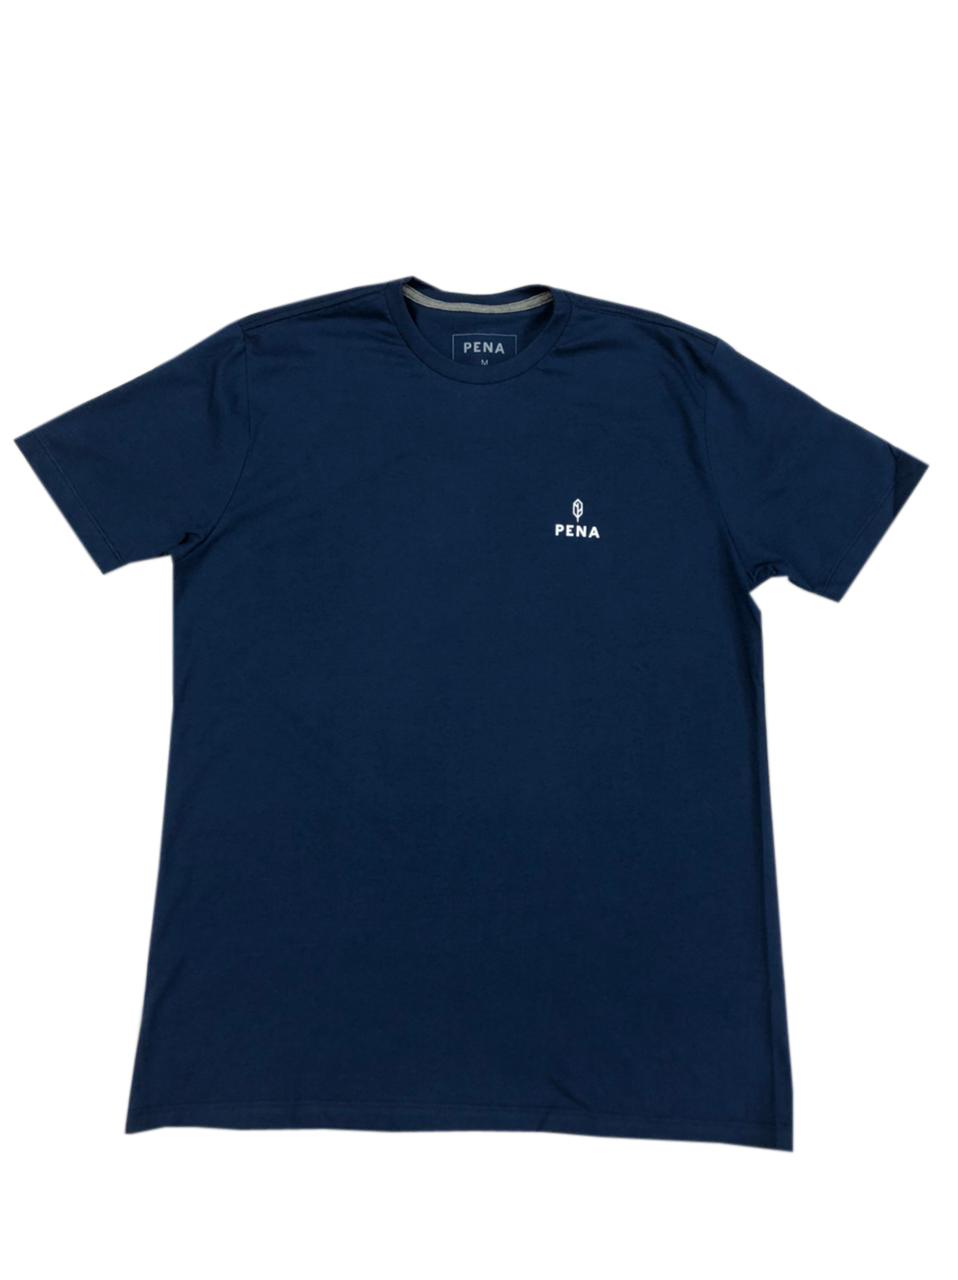 Camiseta Pena Flower Board